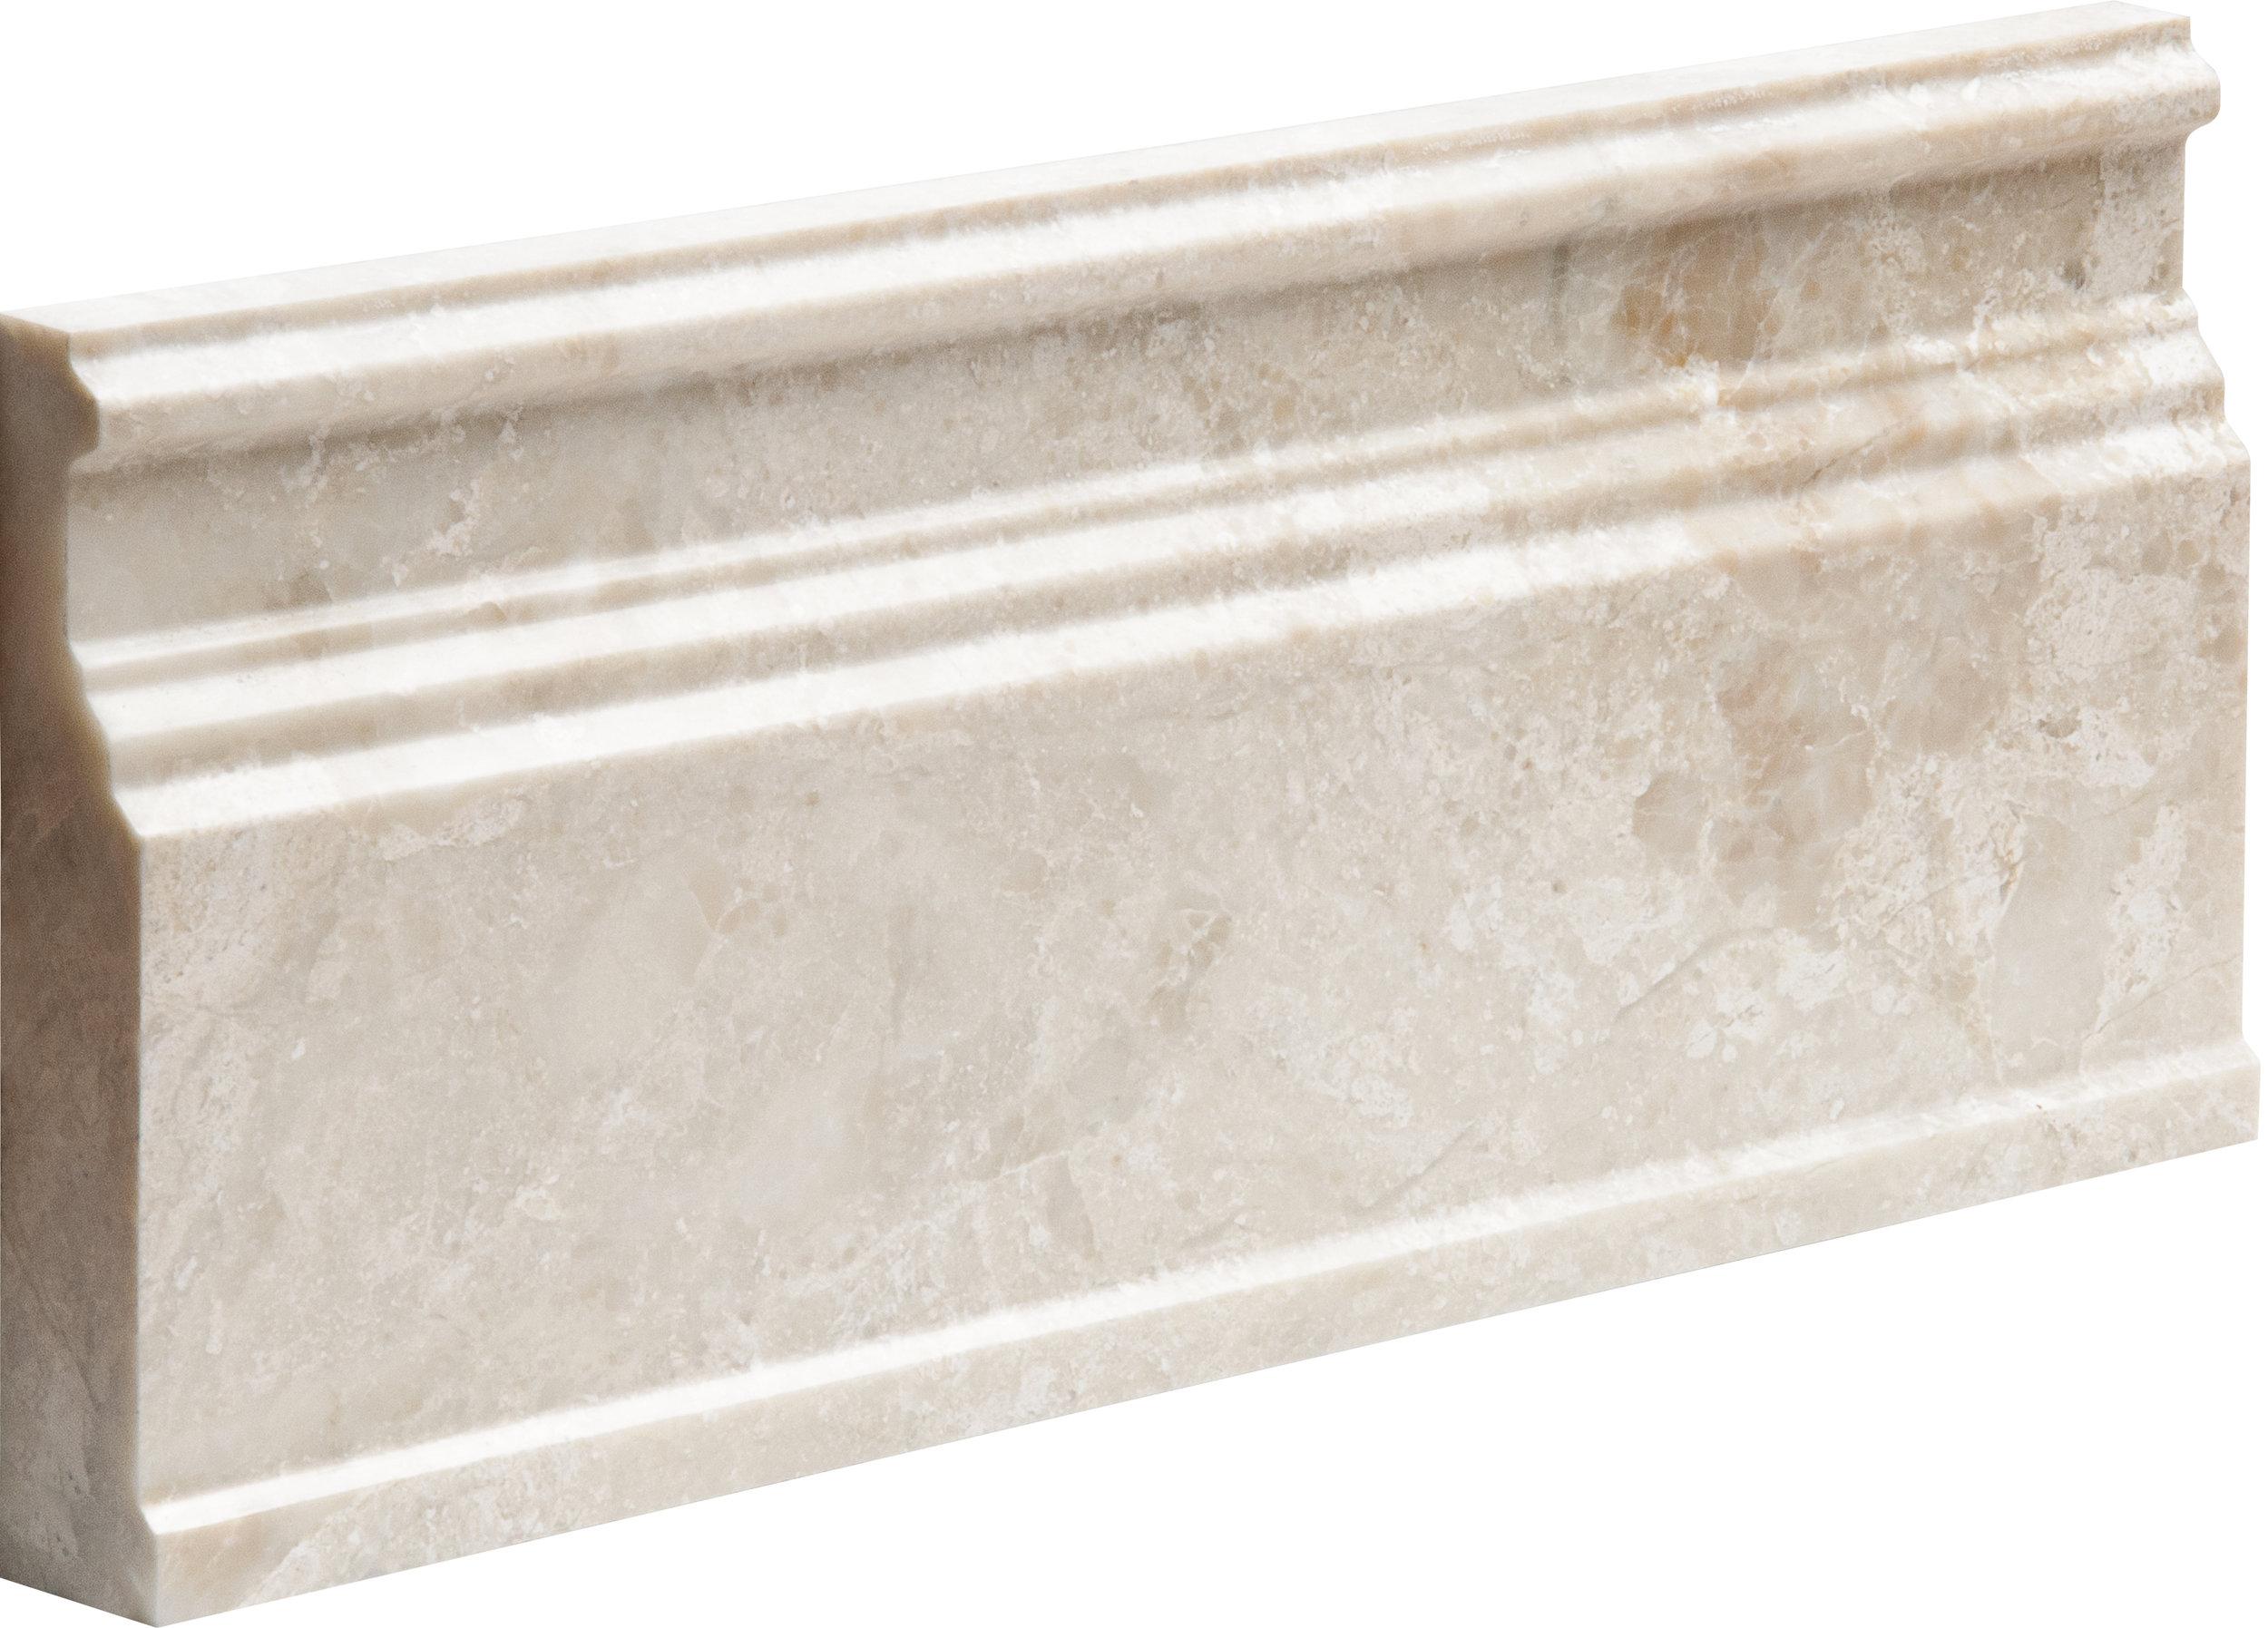 "ML00720 diana royal polished modern base molding 5 1/16""x12""x15/16"""